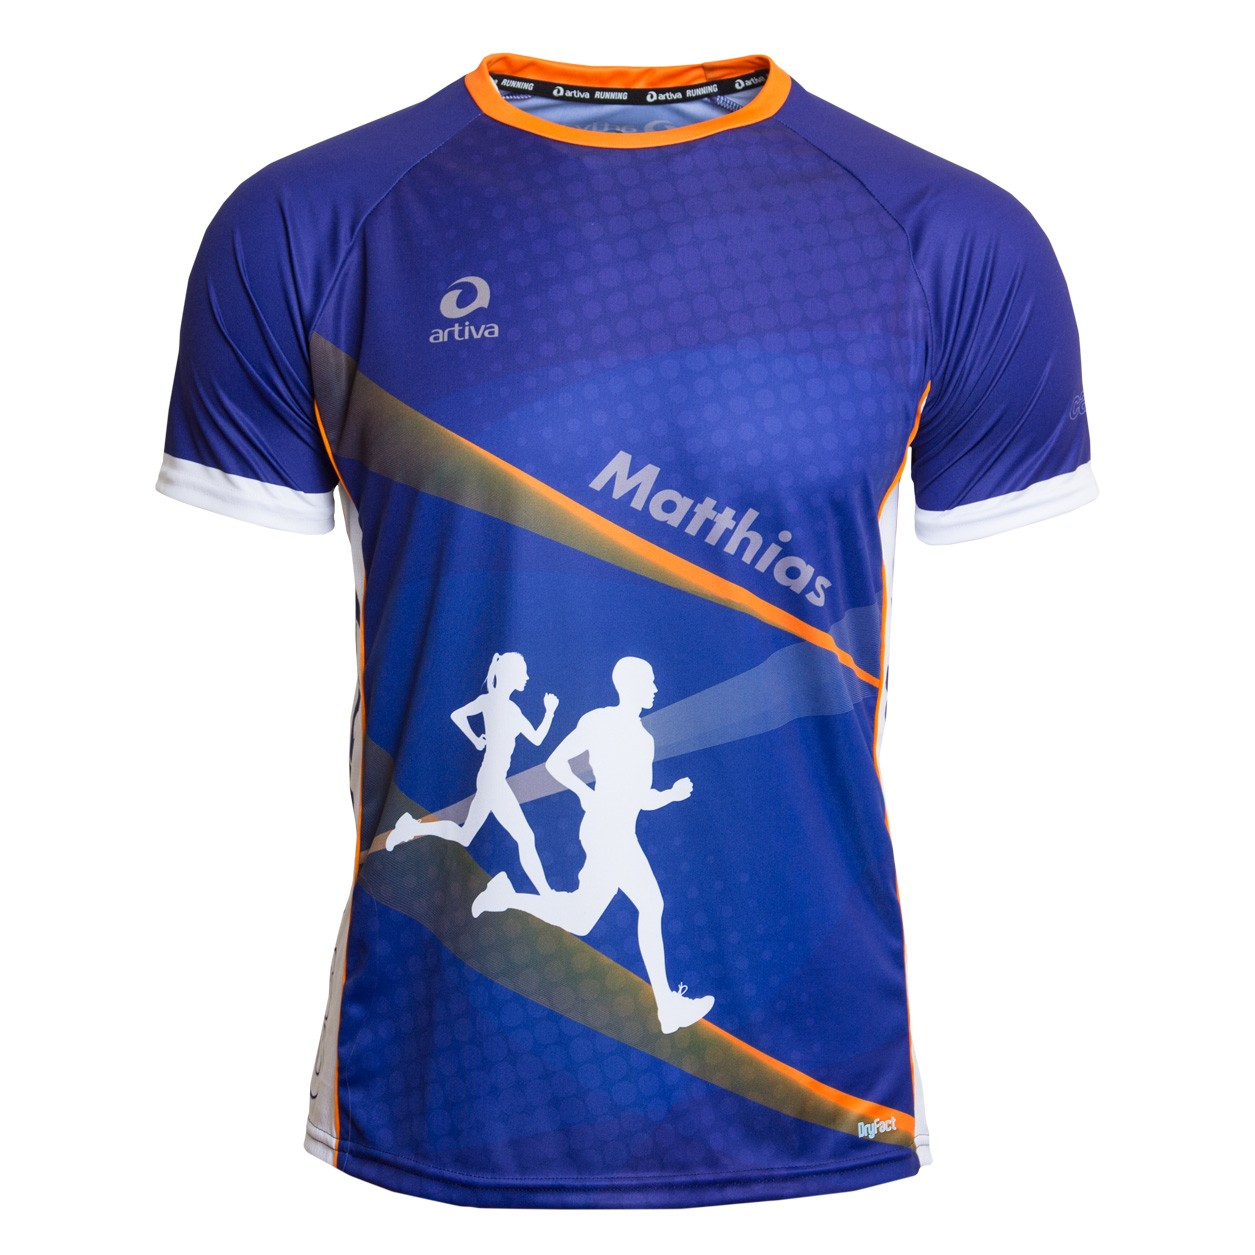 cadwork - Individuelle Shirts im Firmen CI